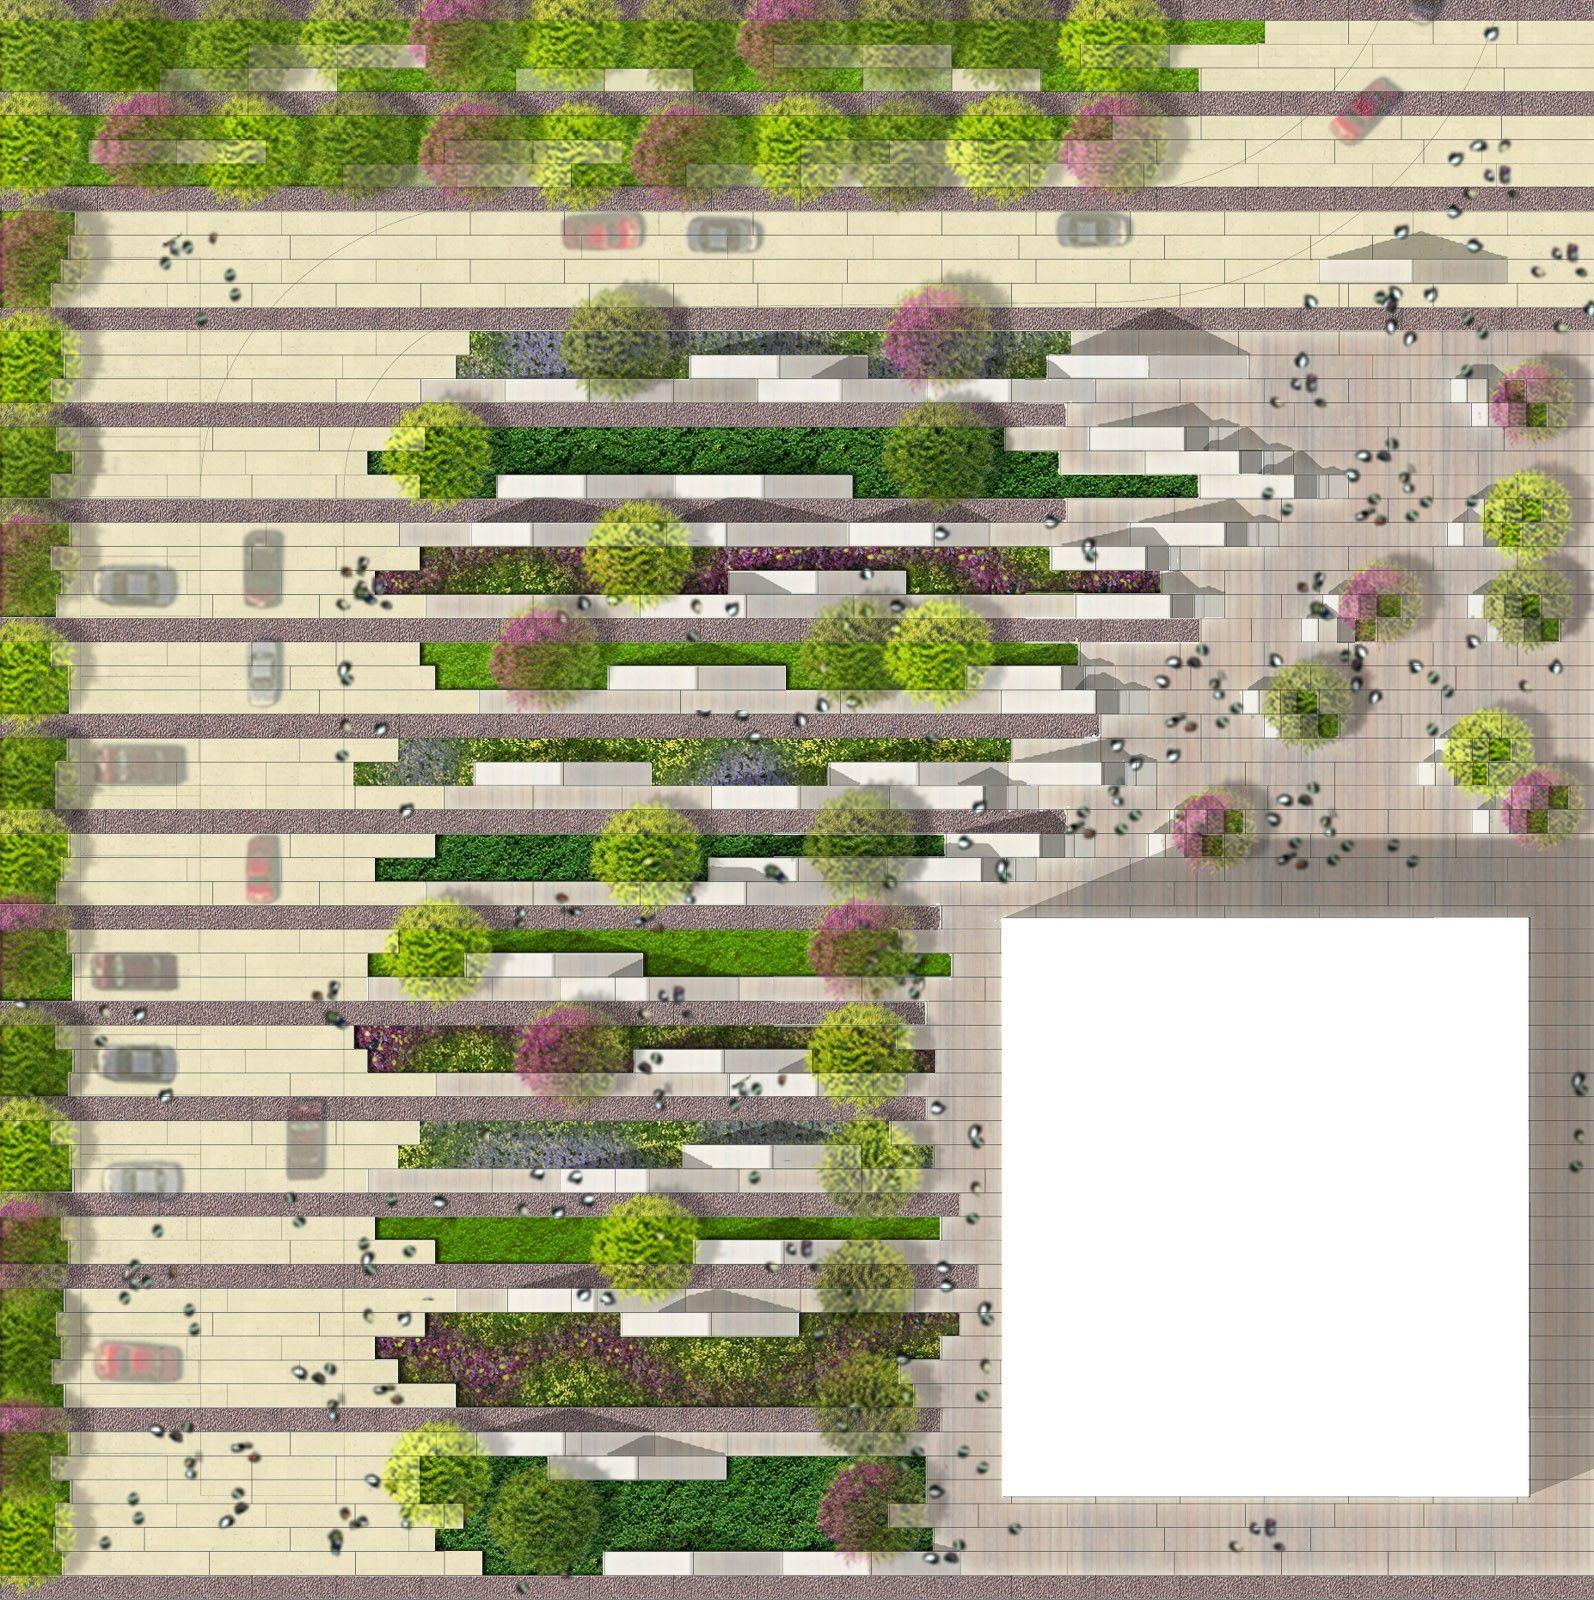 Landscape Architects: Technology Business District